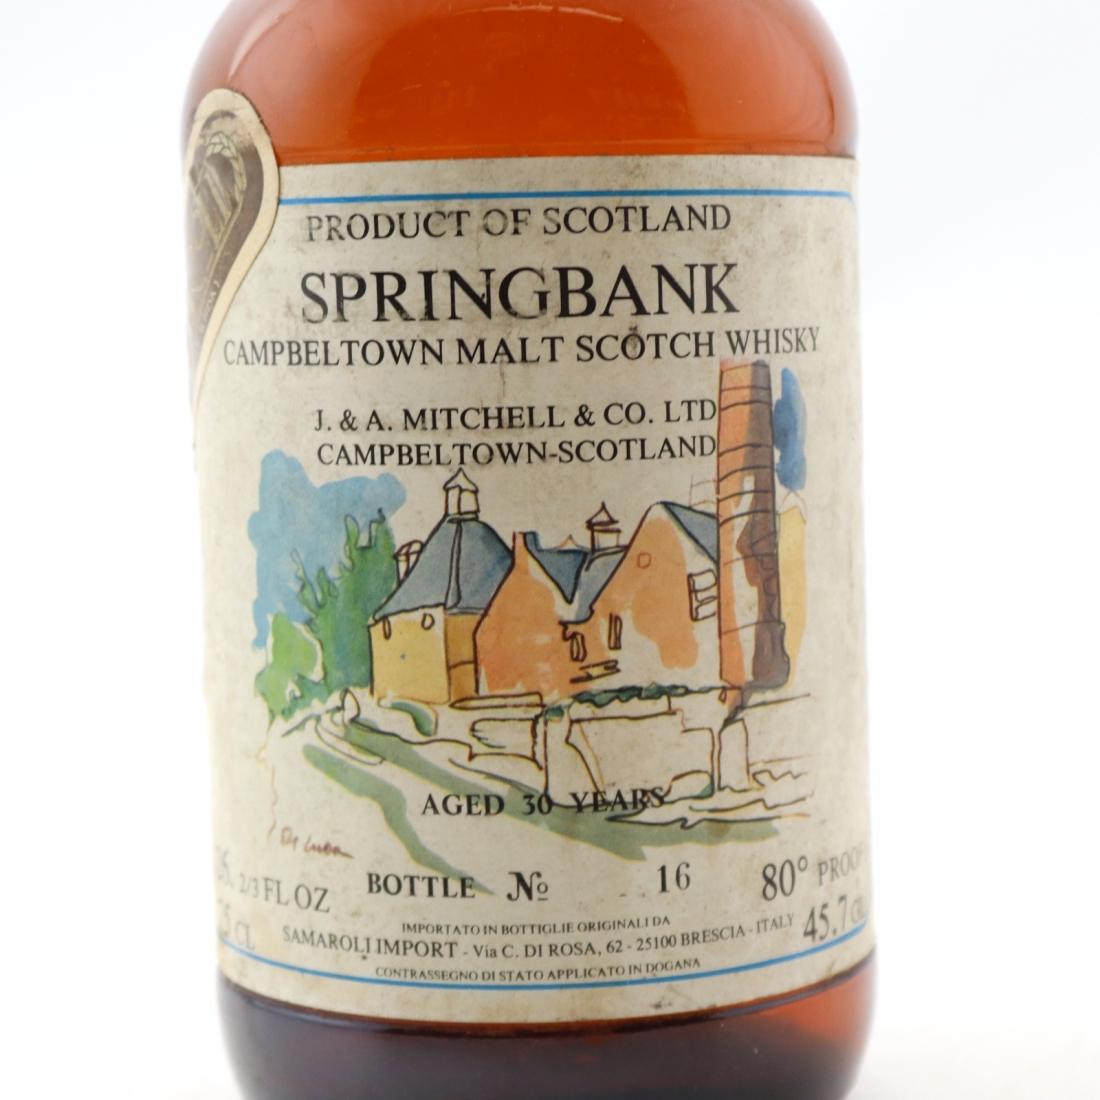 Springbank 30 Year Old Samaroli / Cadenhead's 1979